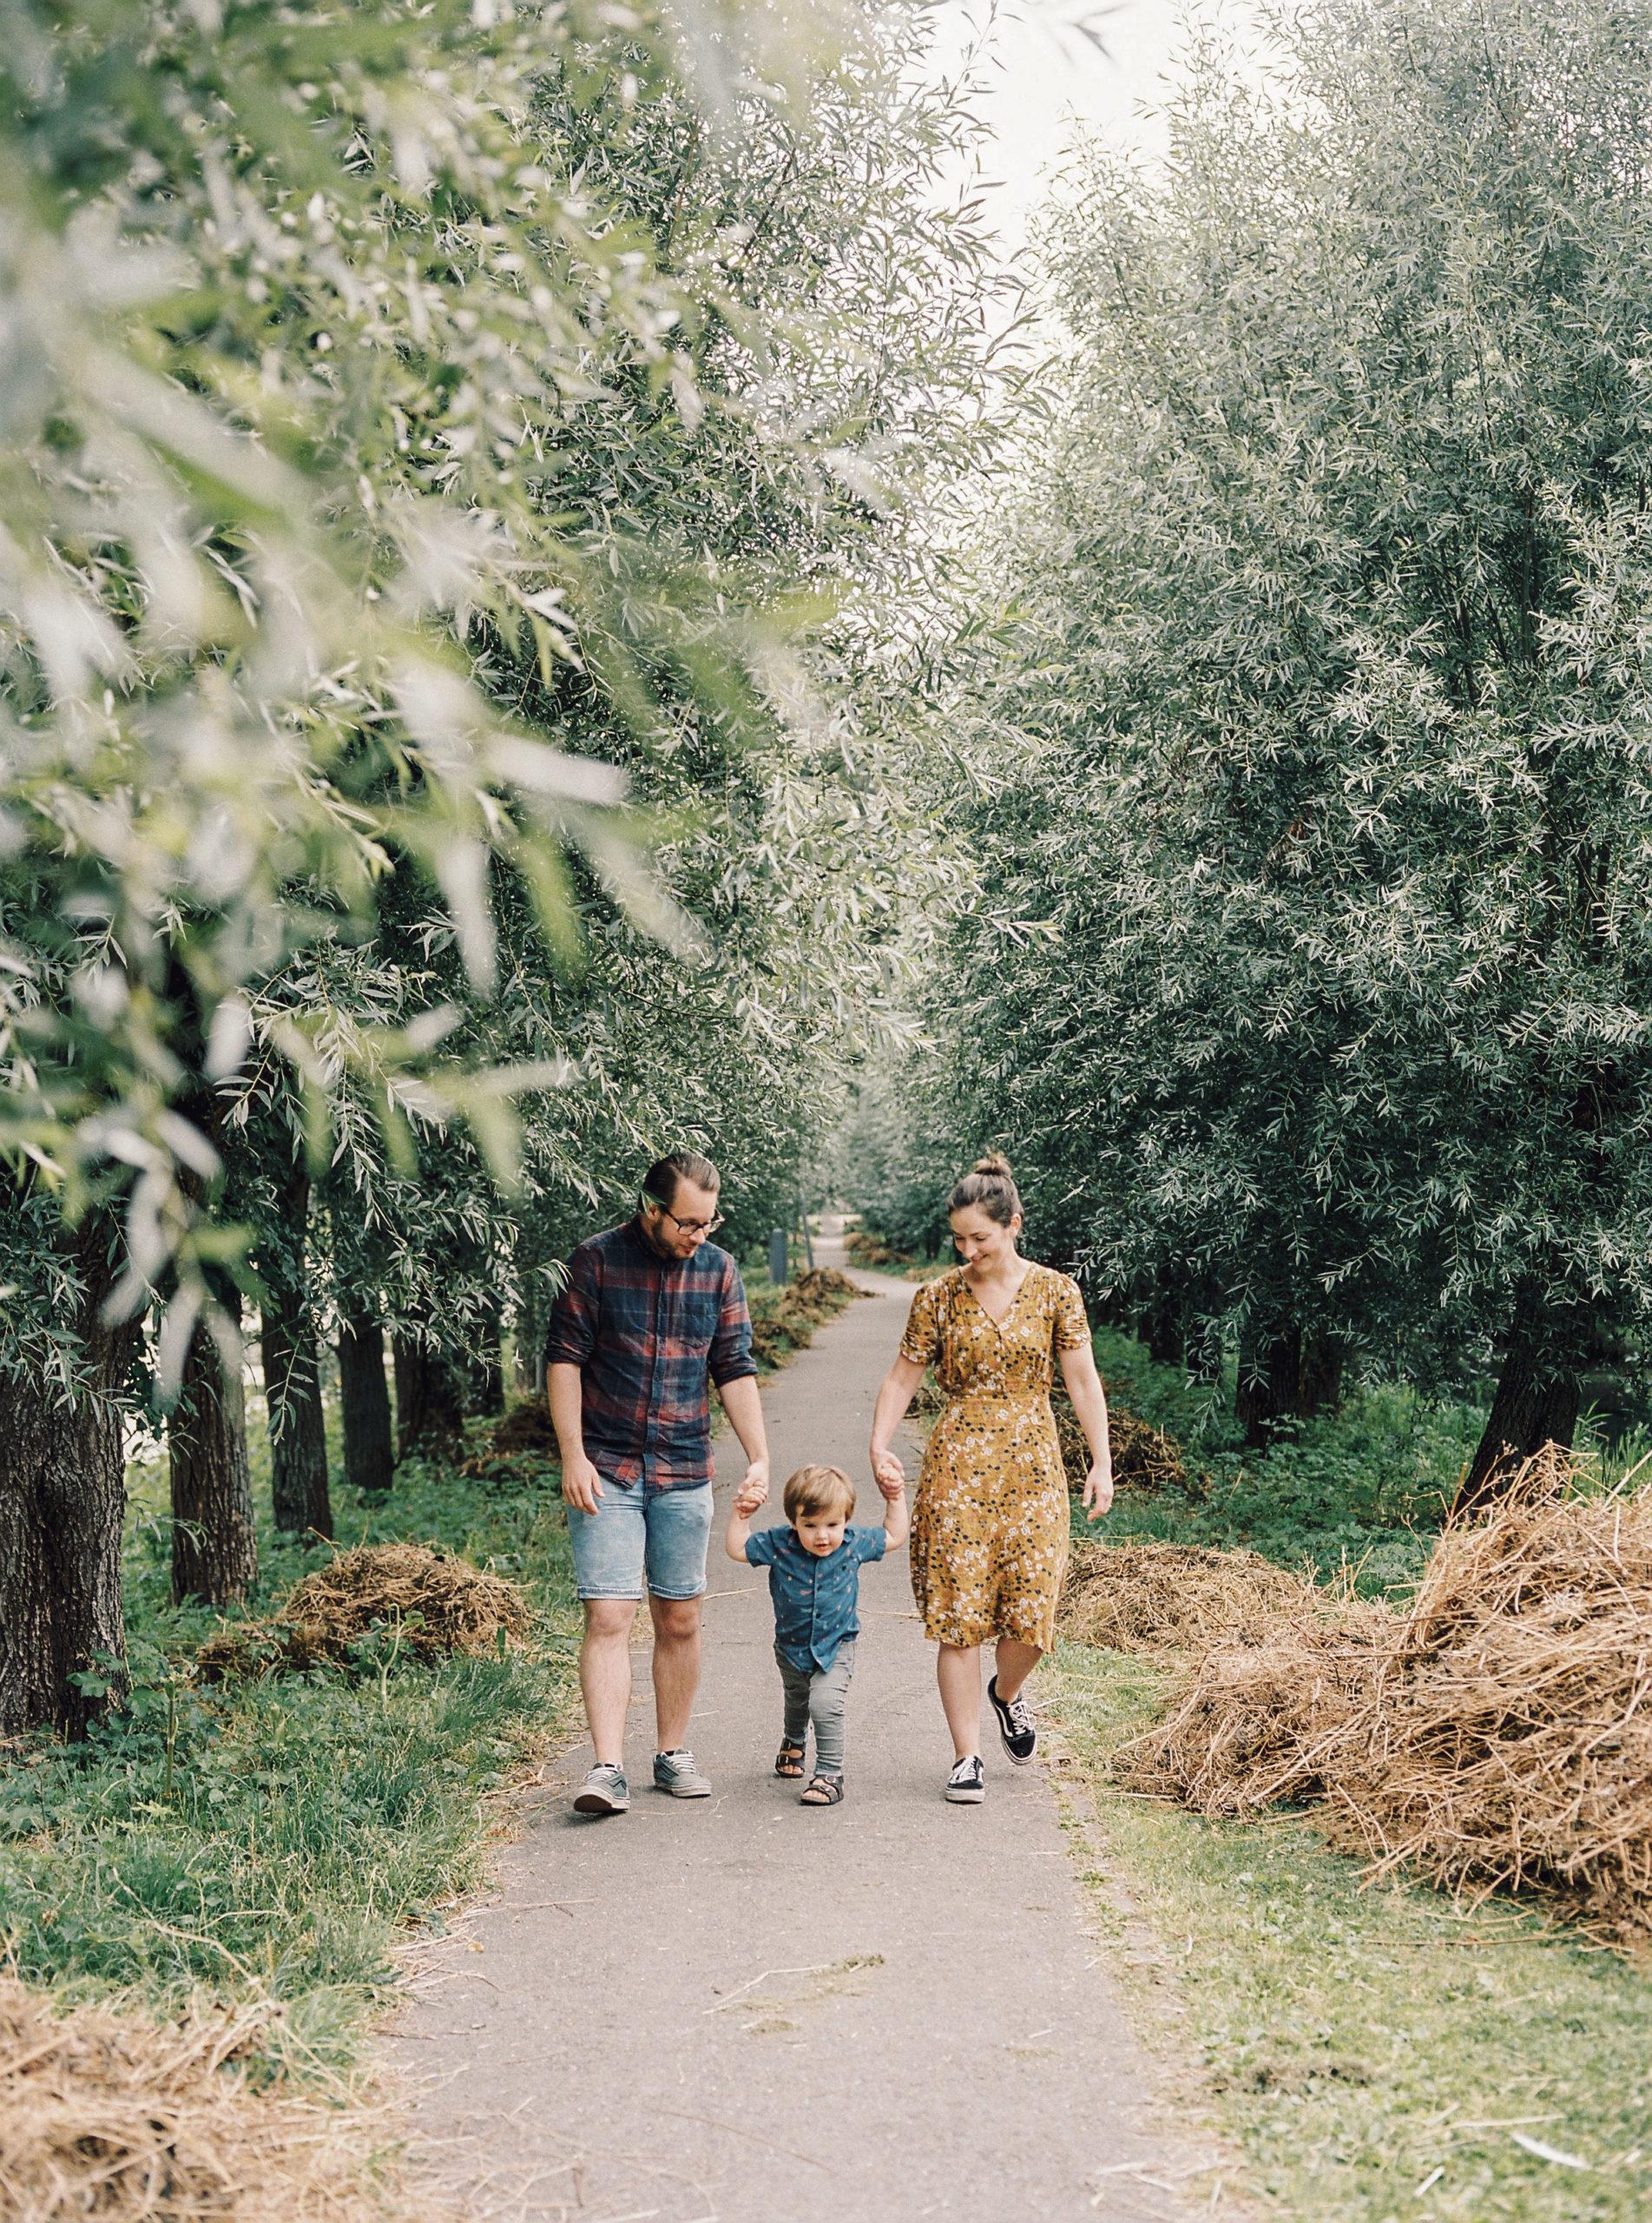 familieshoot rotterdam park melanchtonpark natuur buiten ontspannen gezin